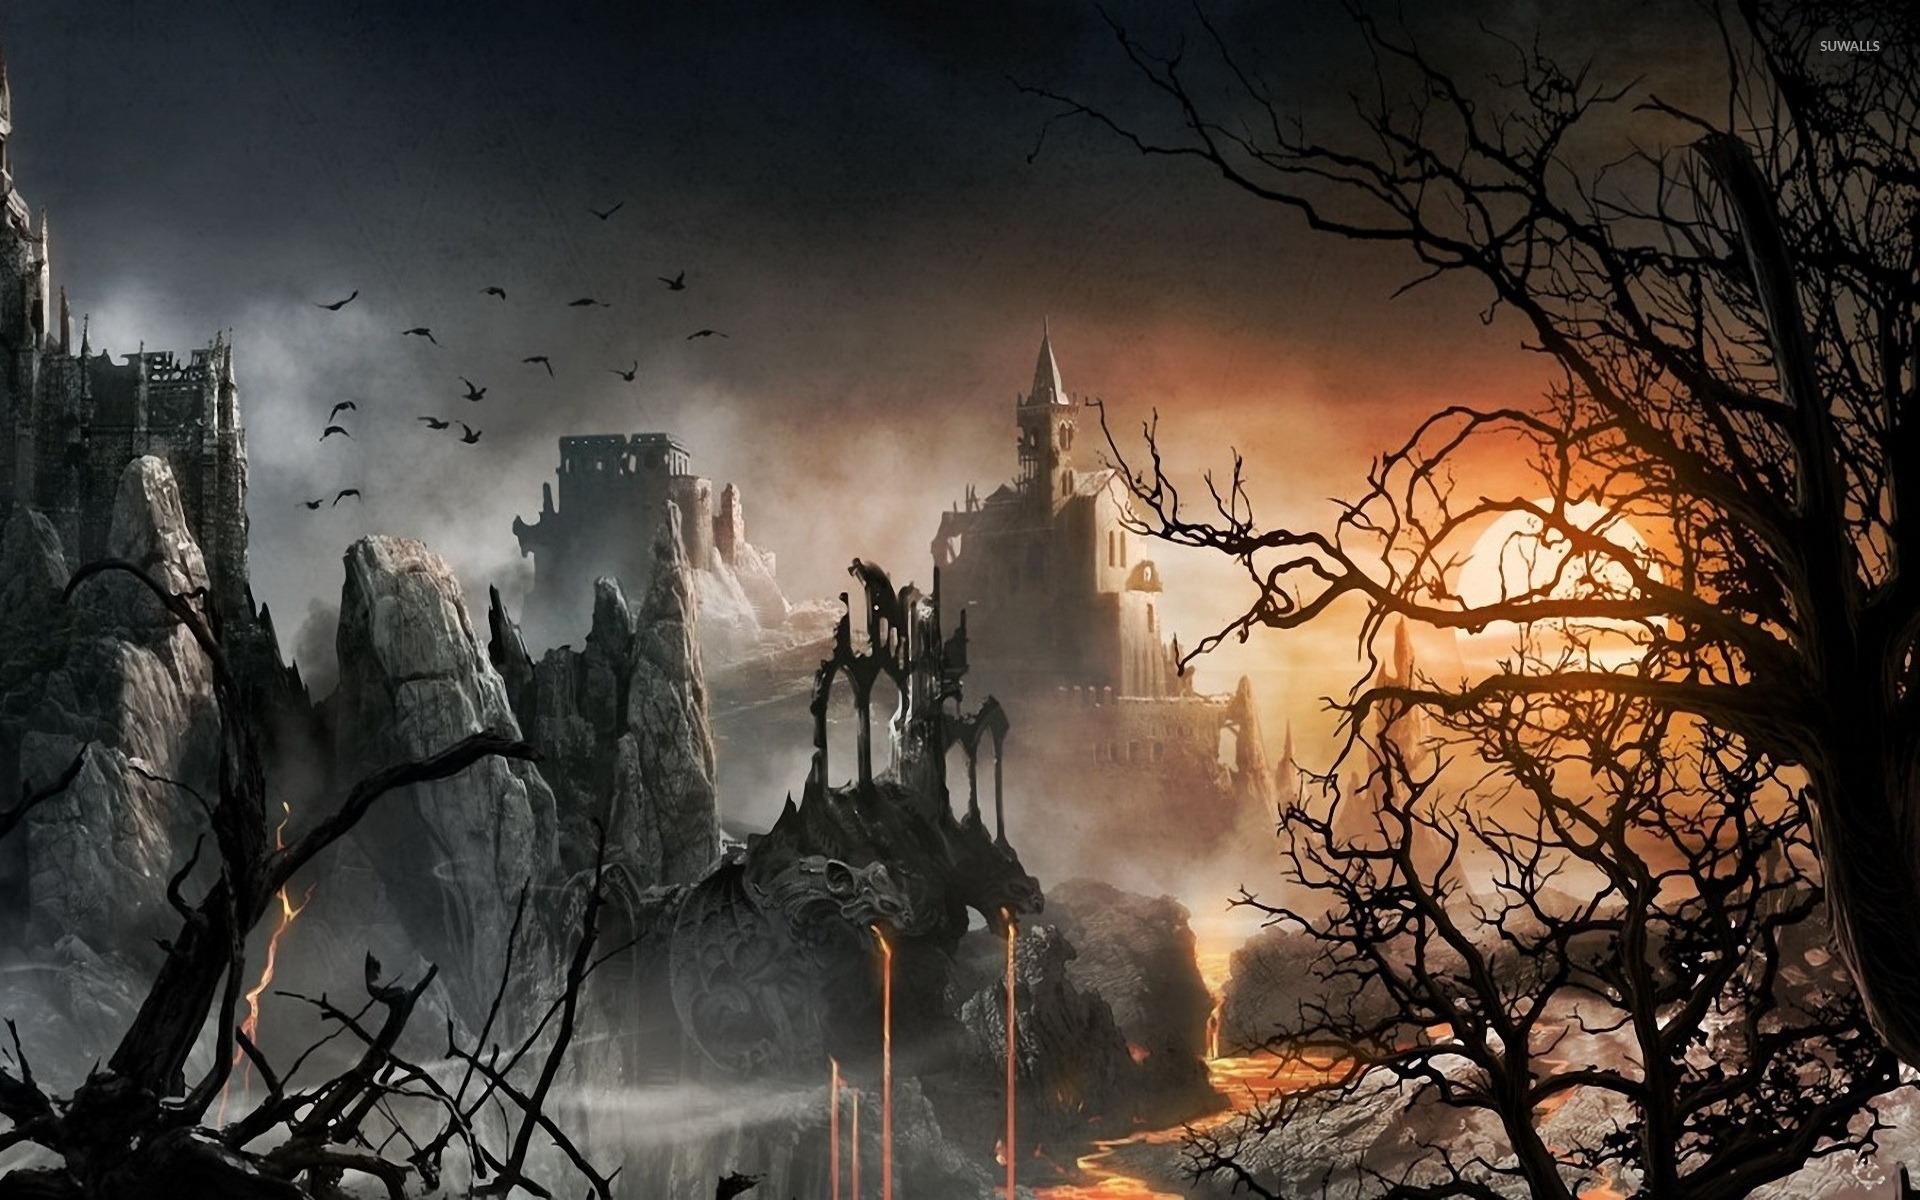 Dark Castle wallpaper - Game wallpapers - #38160